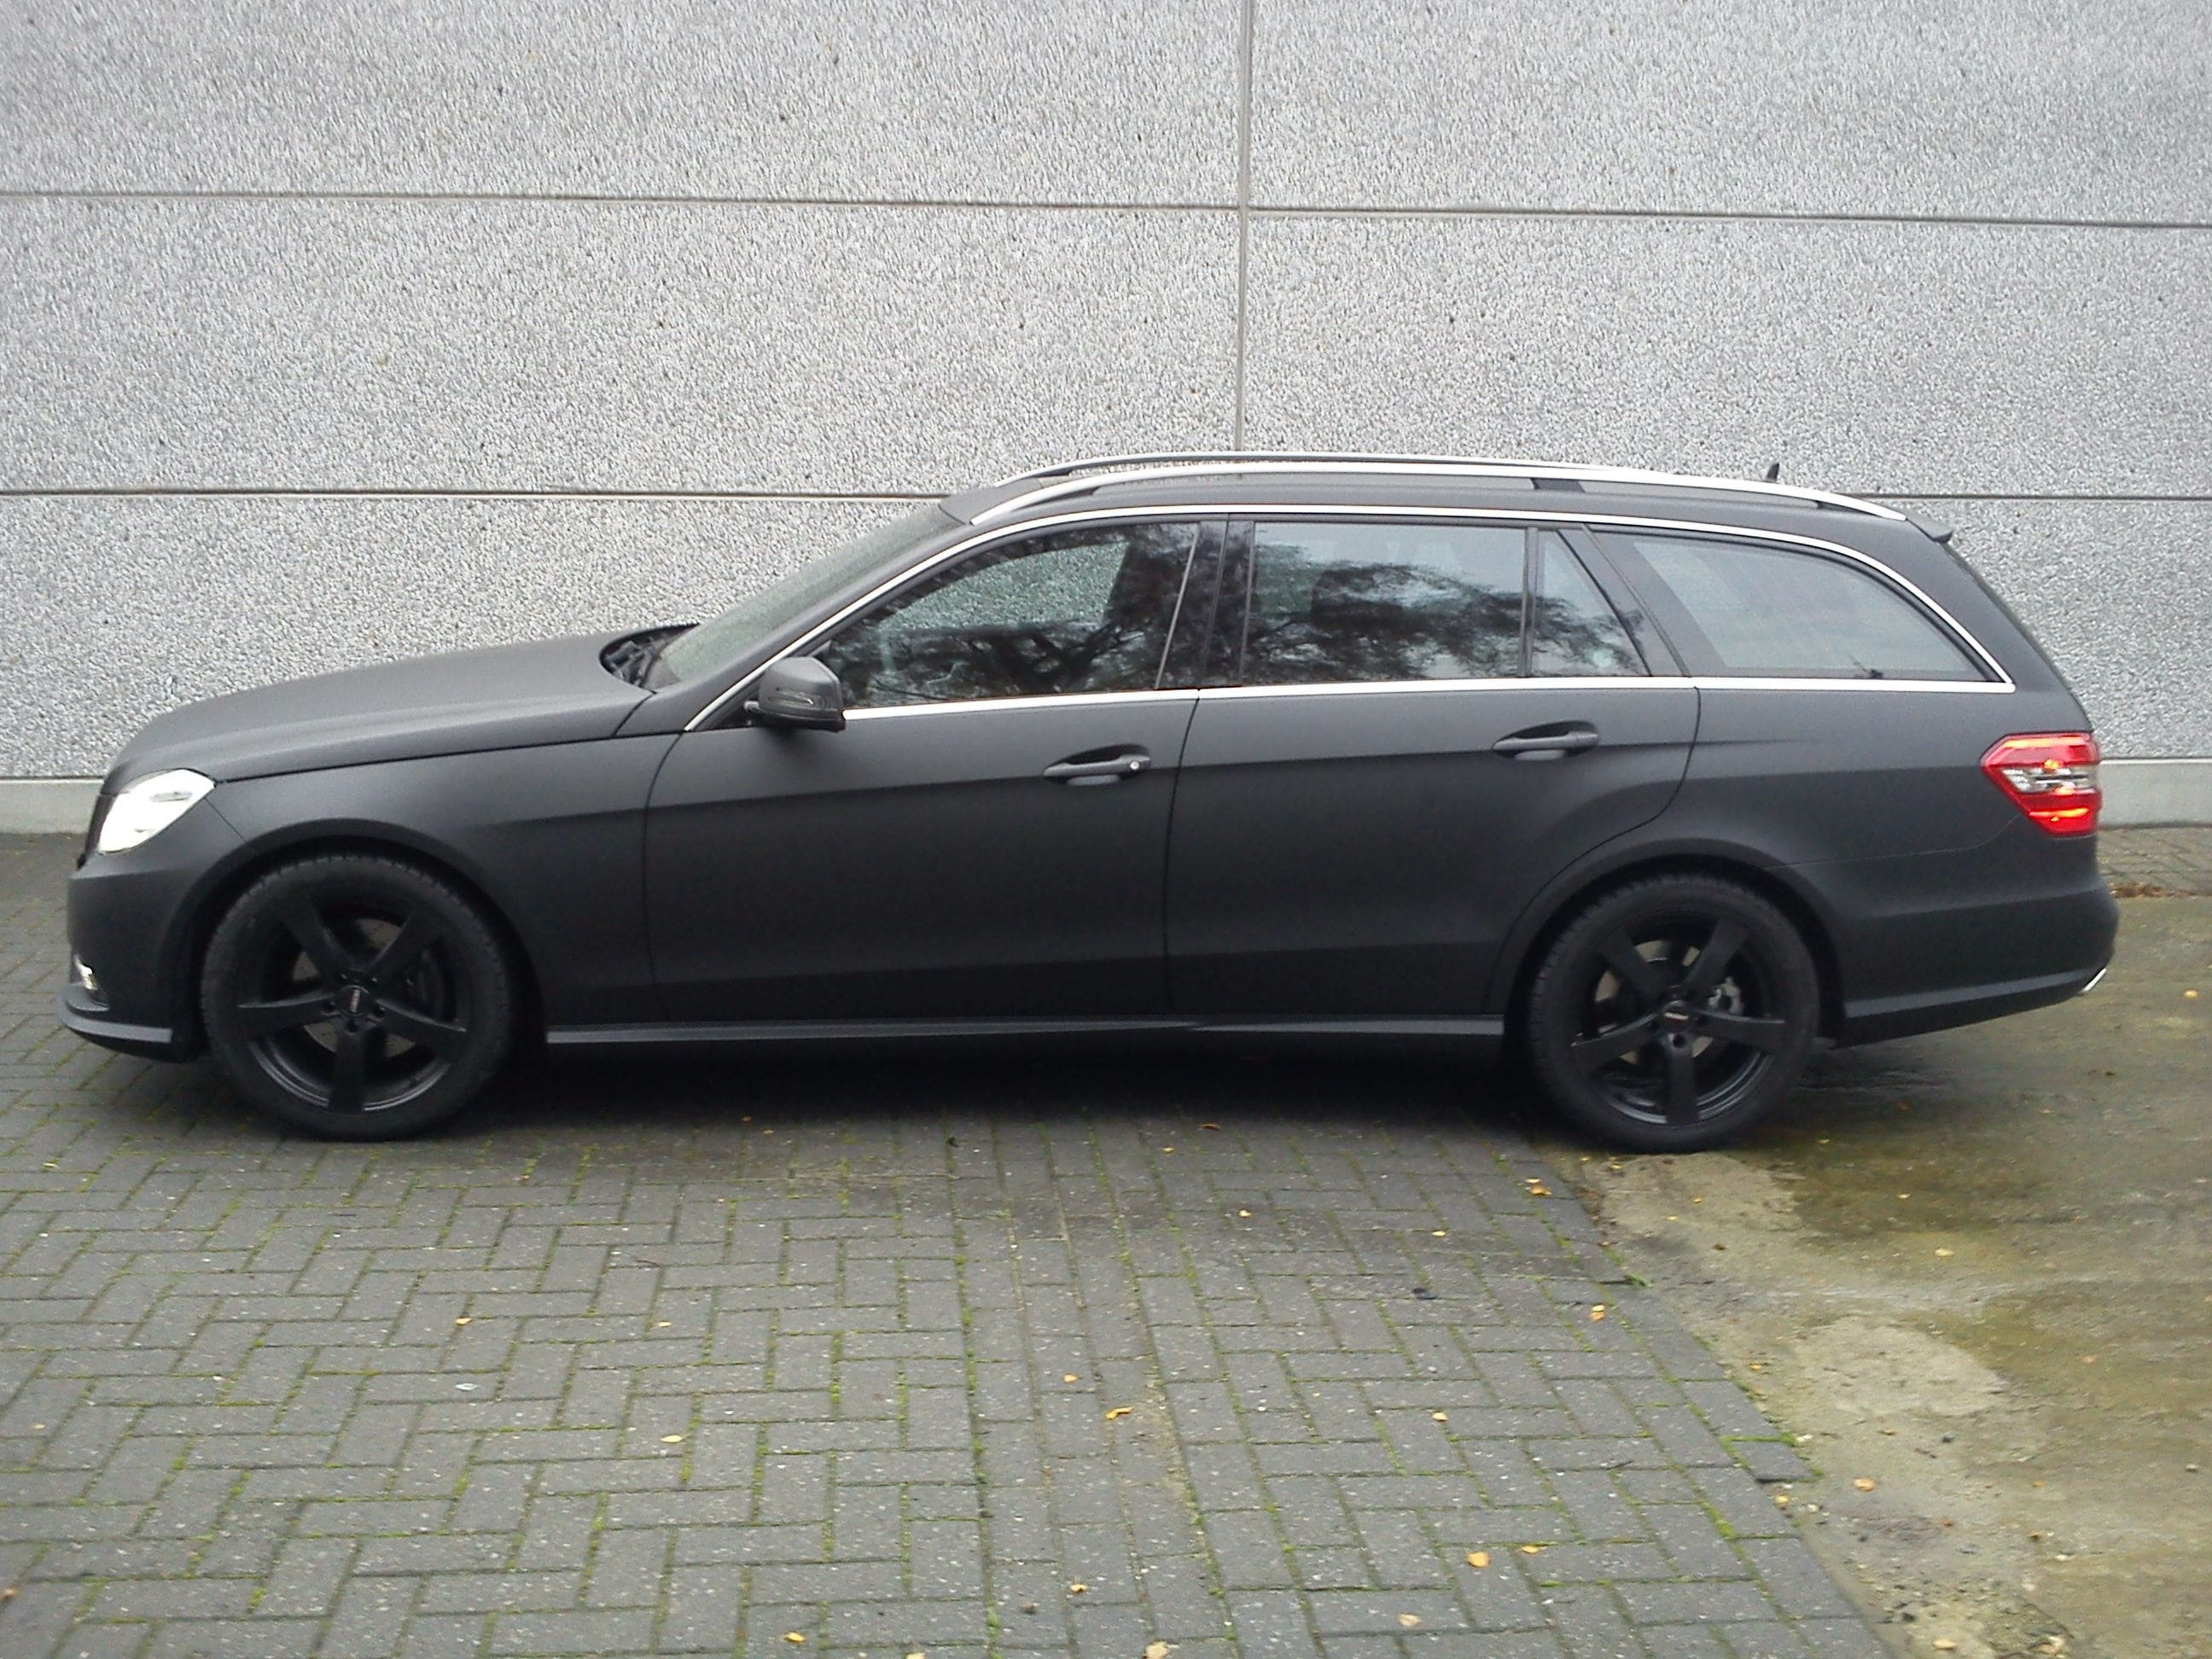 Mercedes E320 met Mat Zwarte Wrap, Carwrapping door Wrapmyride.nu Foto-nr:6229, ©2020